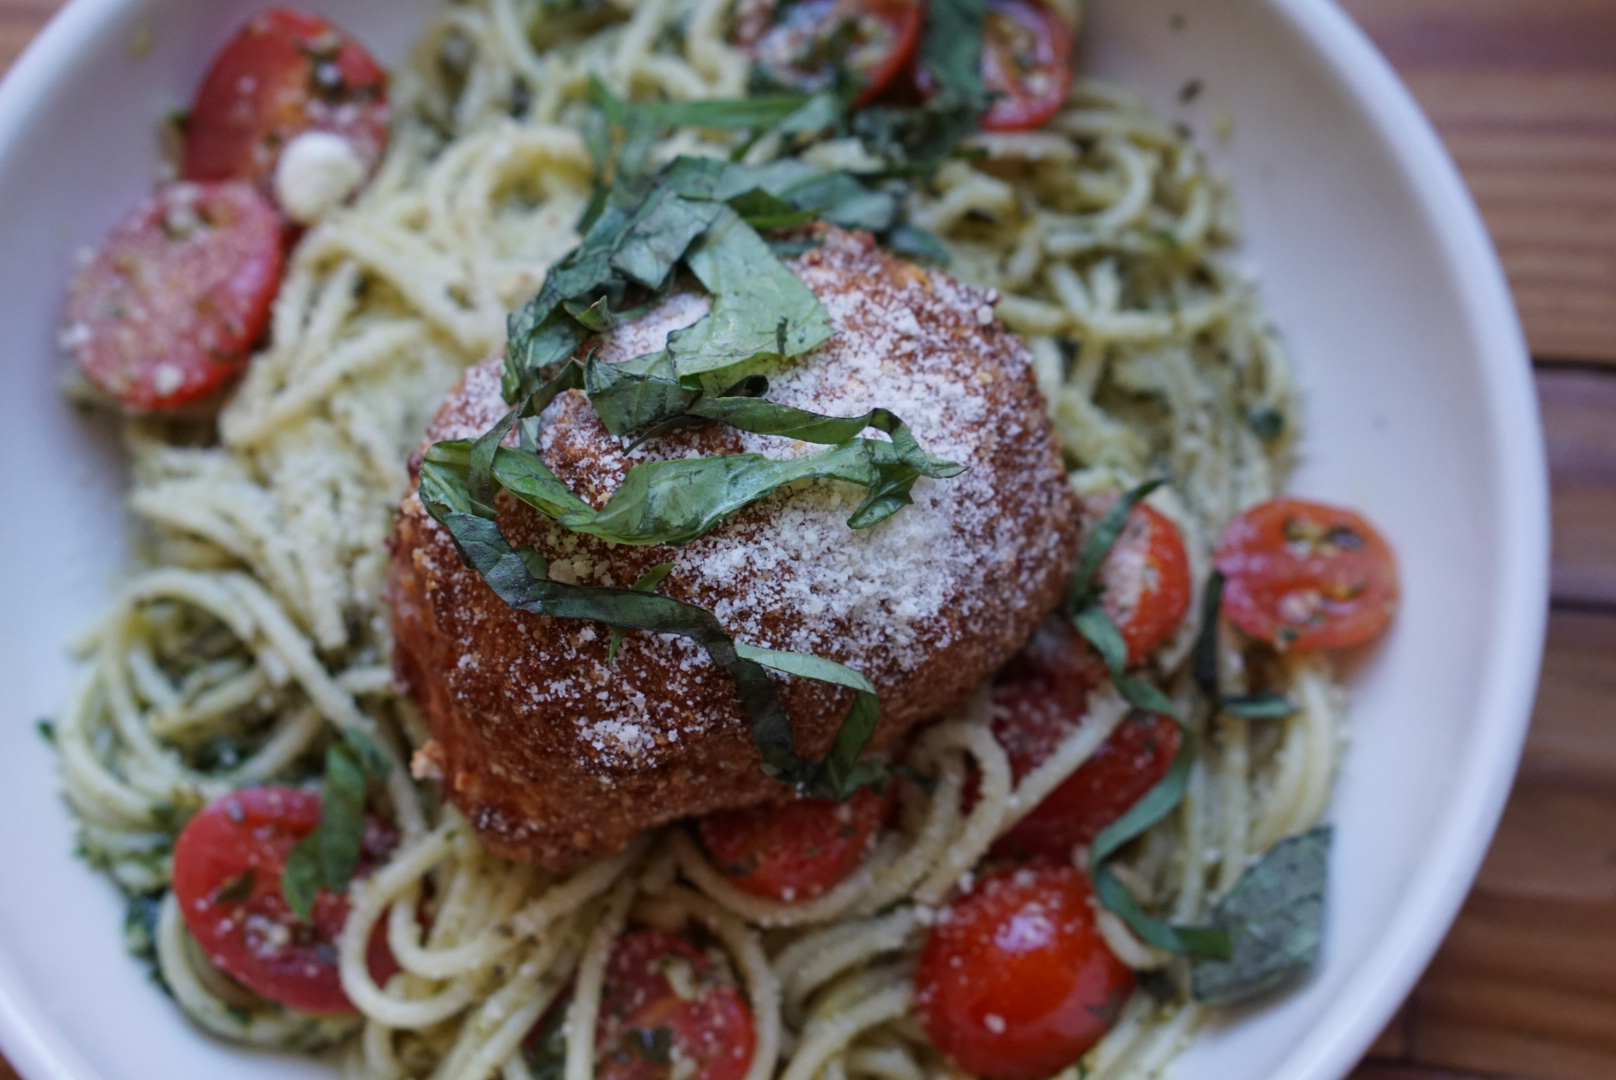 burrata parmesan - fried burrata, spaghetti, sweet basil pesto, grape tomato, parmesan cheese, basil